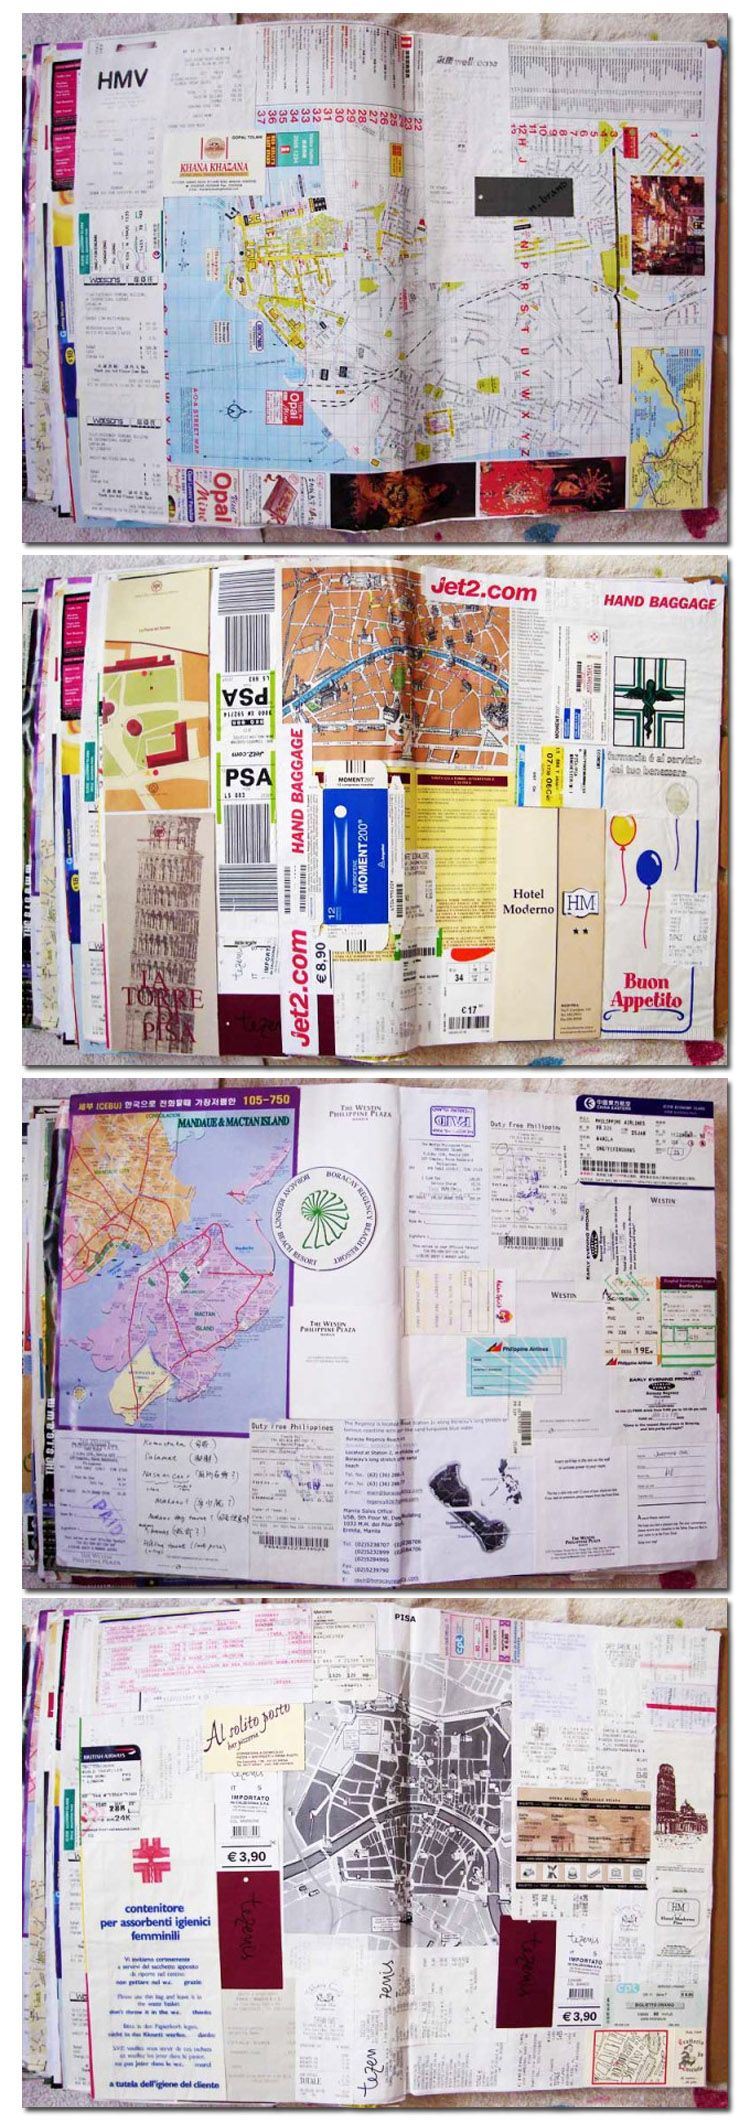 Scrapbook ideas easy - Travel Scrapbook Idea Http Shantihshalaholisticarts Com Global Travel Scrapbook